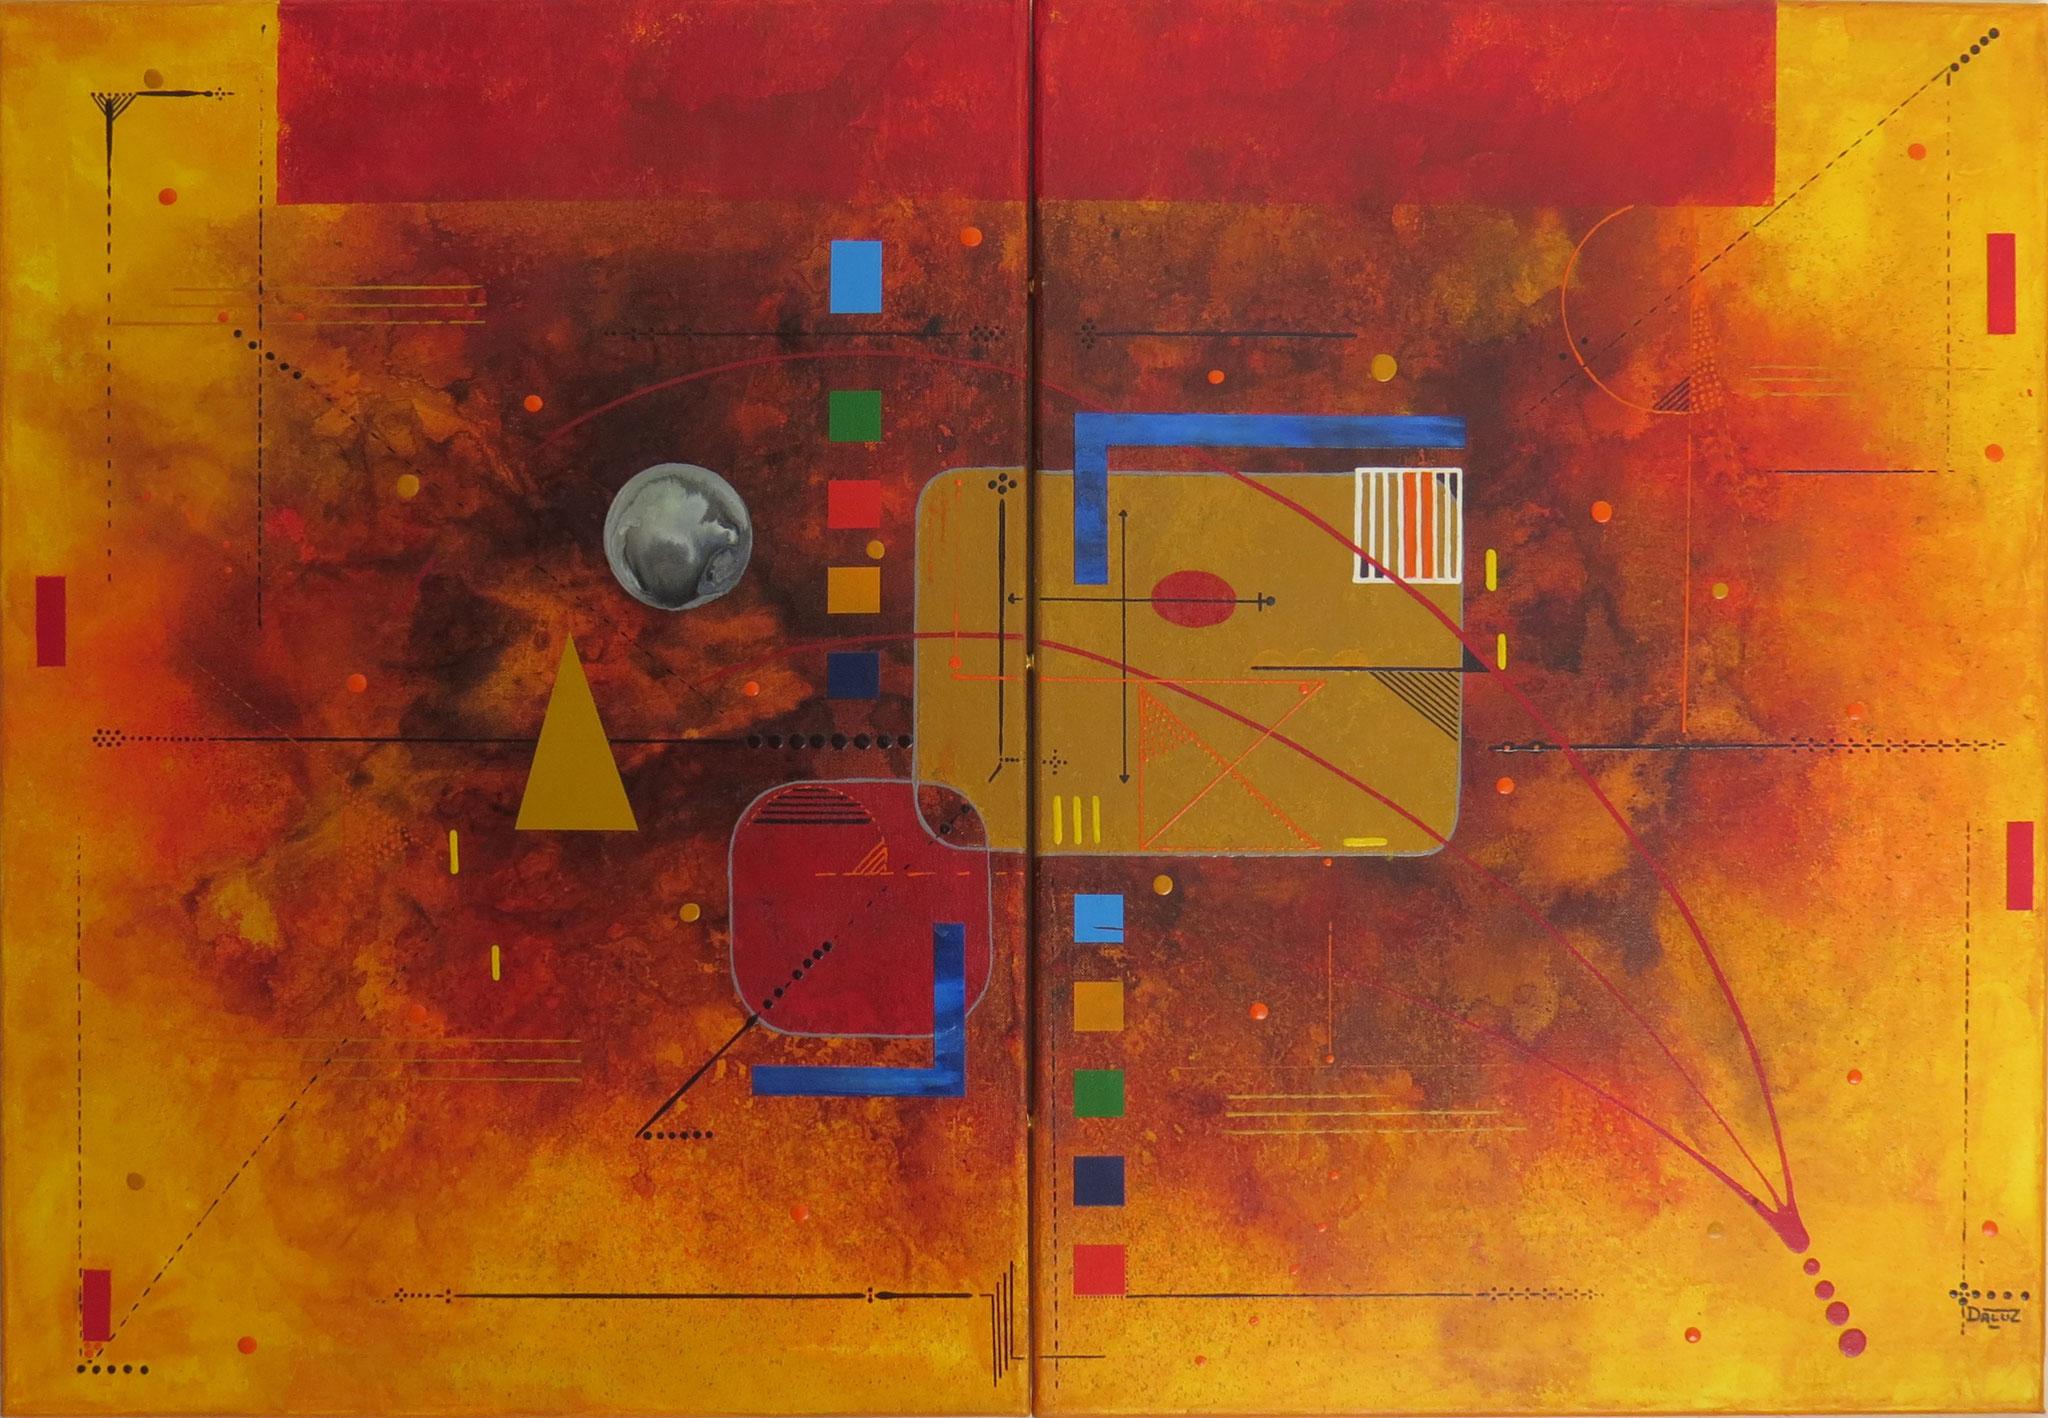 delta - vue face1 - DALUZ GALEGO - peinture abstraite